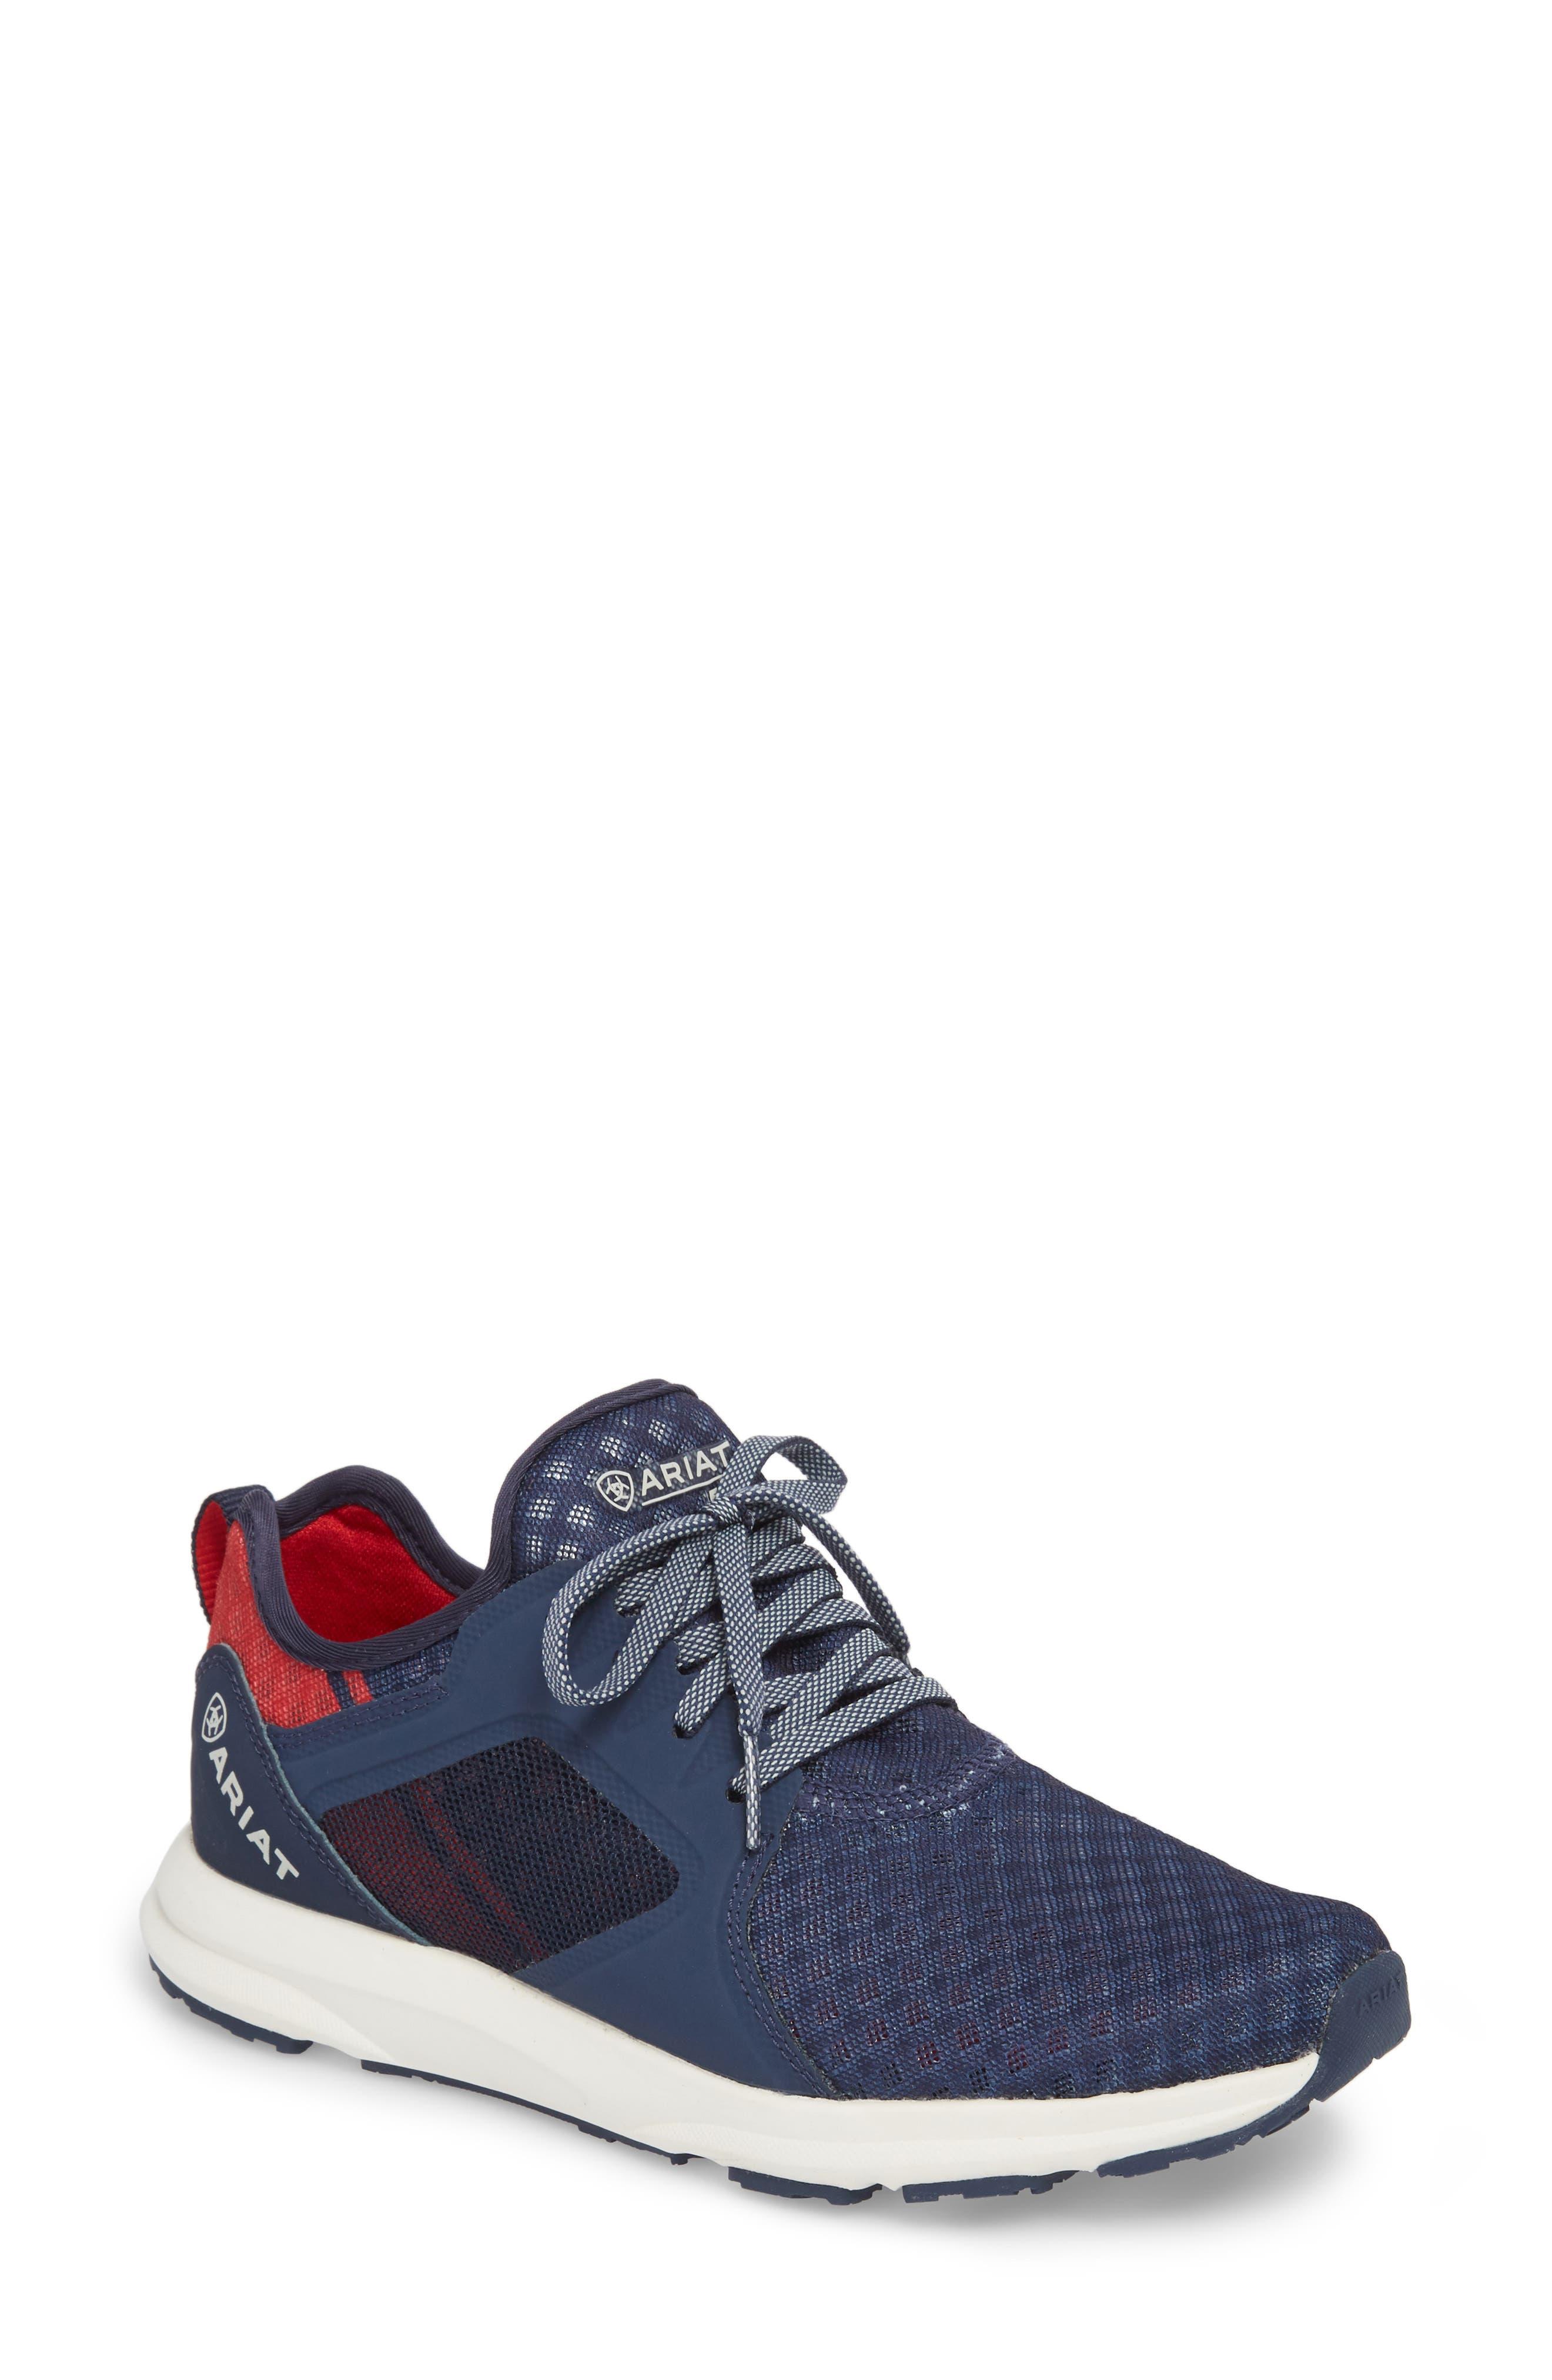 Ariat Fuse Print Sneaker (Women)